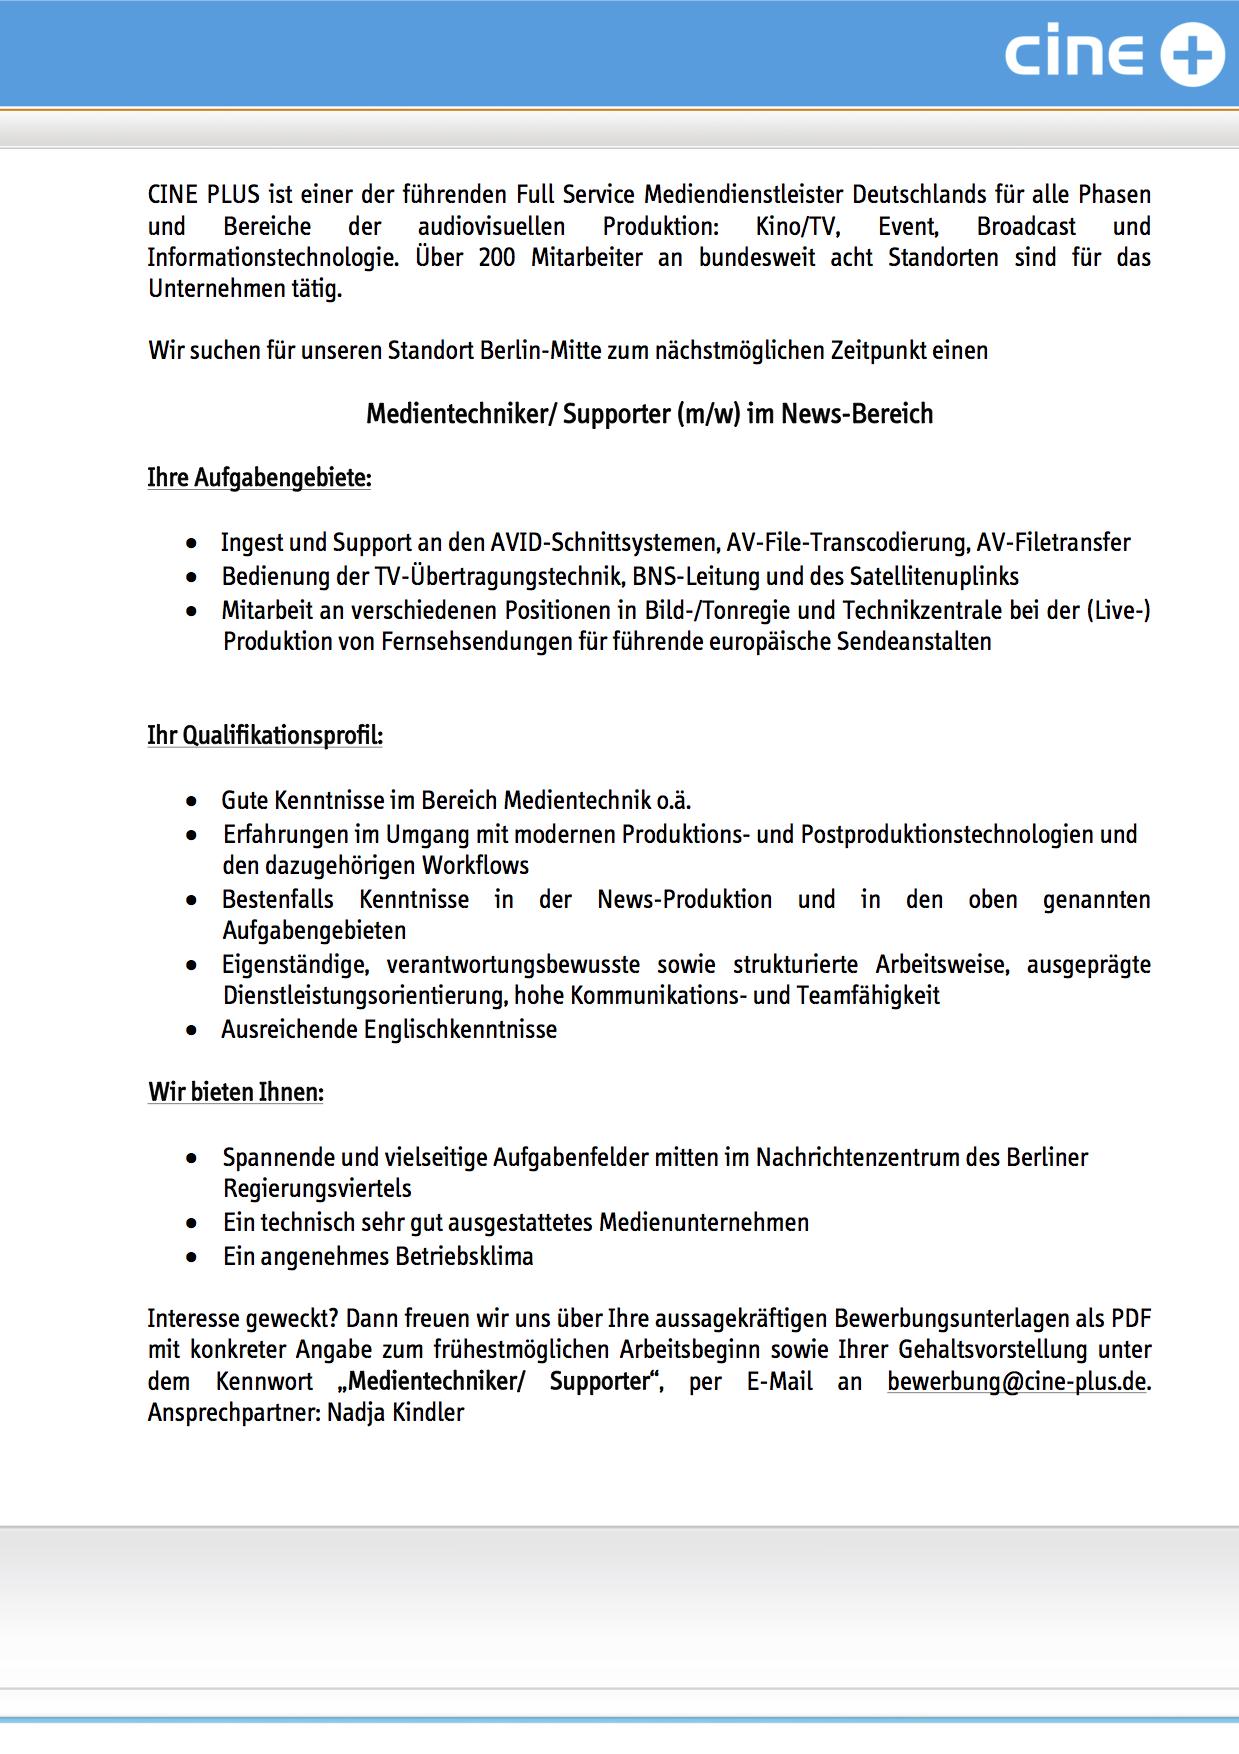 Cine Plus Media Service Gmbh Co Kg Berlin Sucht Medientechniker